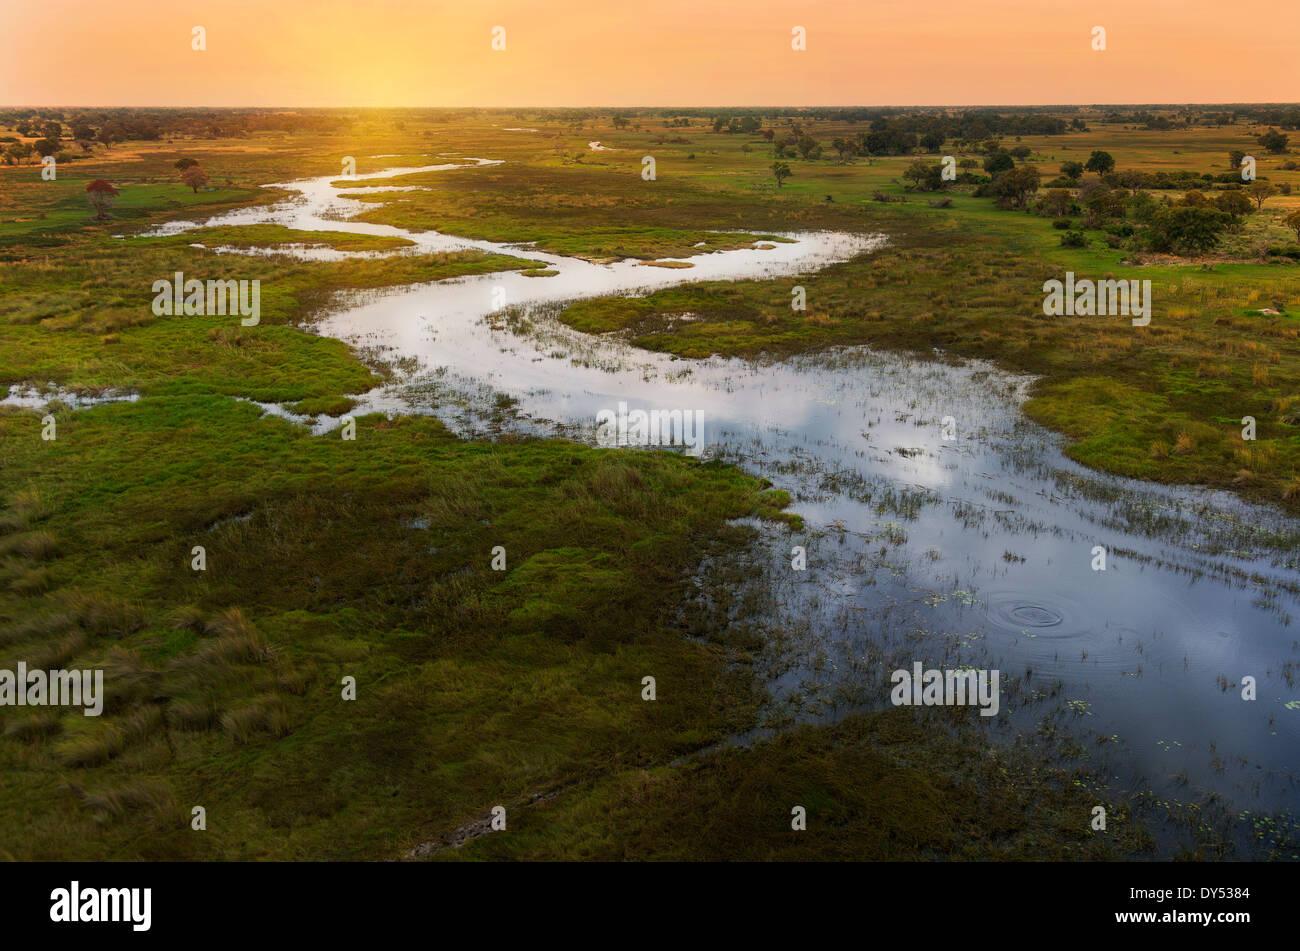 Sunset on Okavango Delta, Chobe National Park, Botswana, Africa - Stock Image